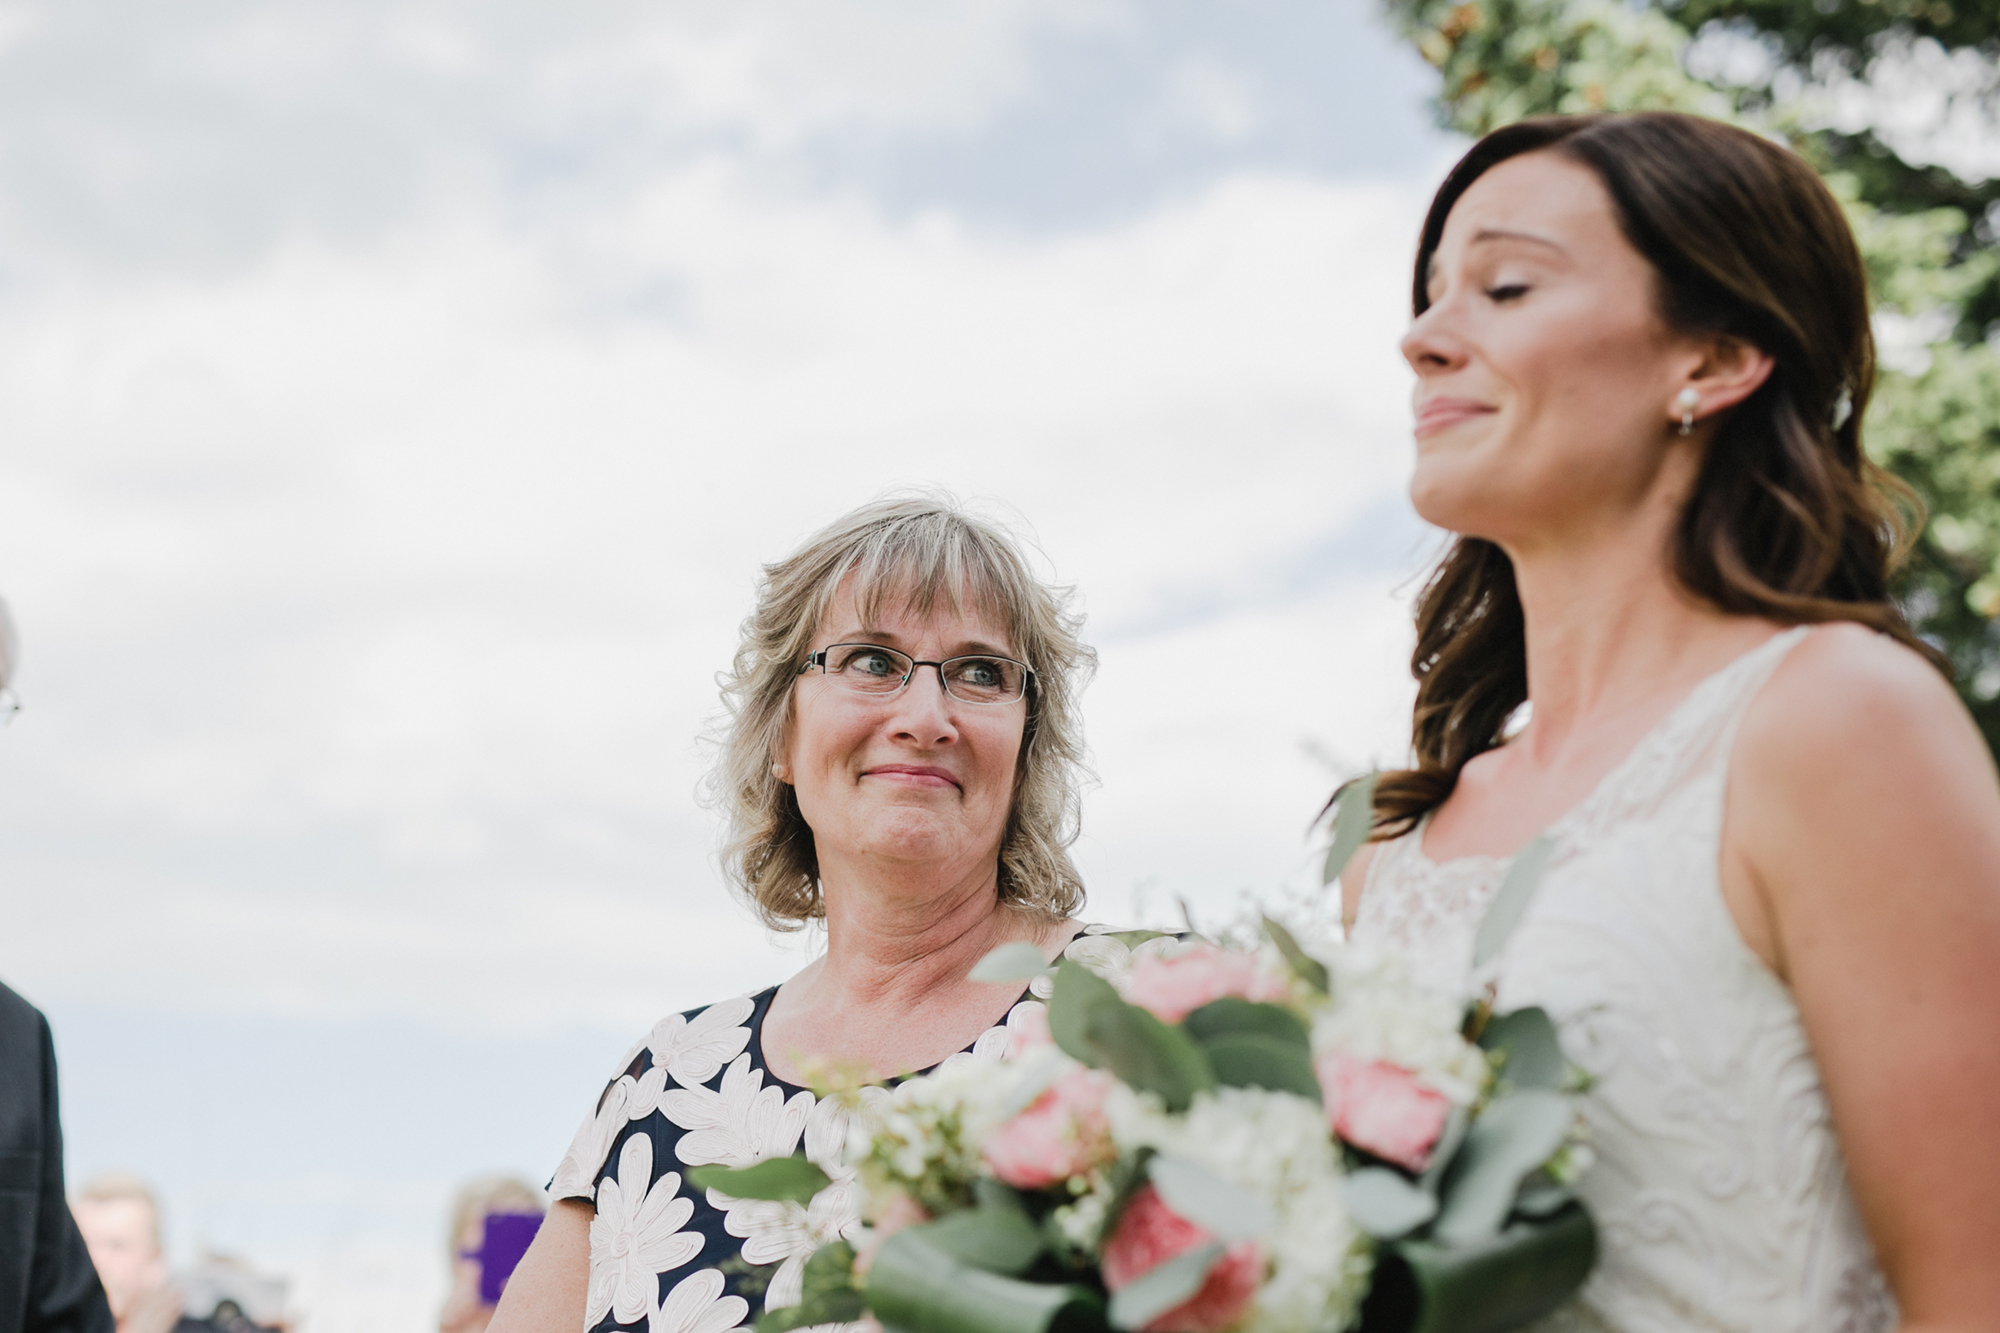 Flower Farm Crowsnest Pass Wedding -051.JPG